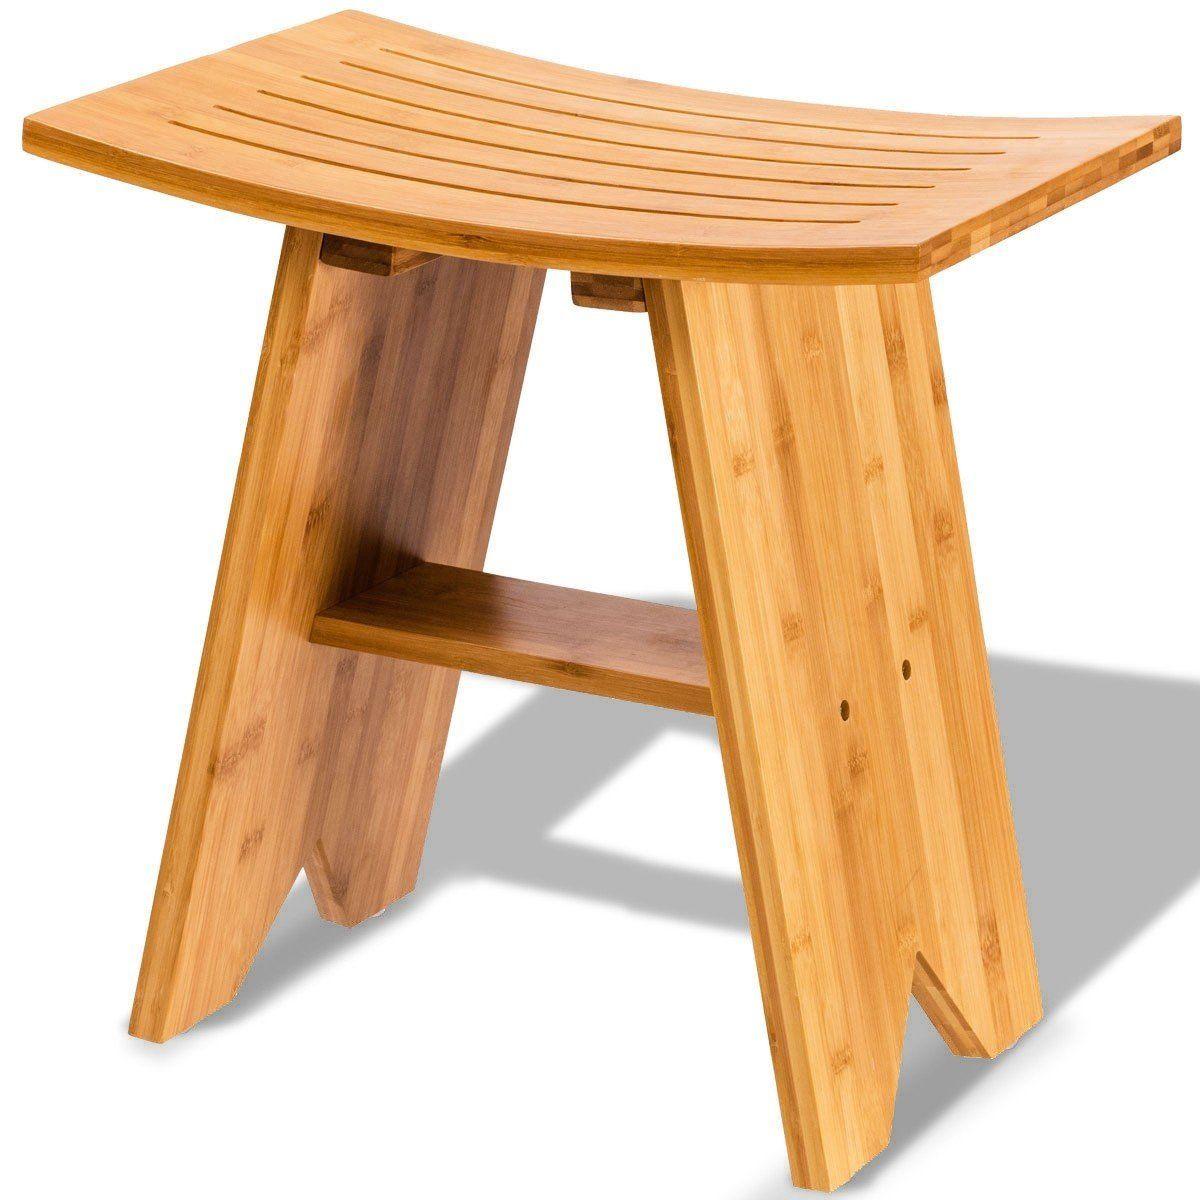 Terrific Spa Bench Wooden Bamboo Shower Stool With Shelf Storage No Theyellowbook Wood Chair Design Ideas Theyellowbookinfo